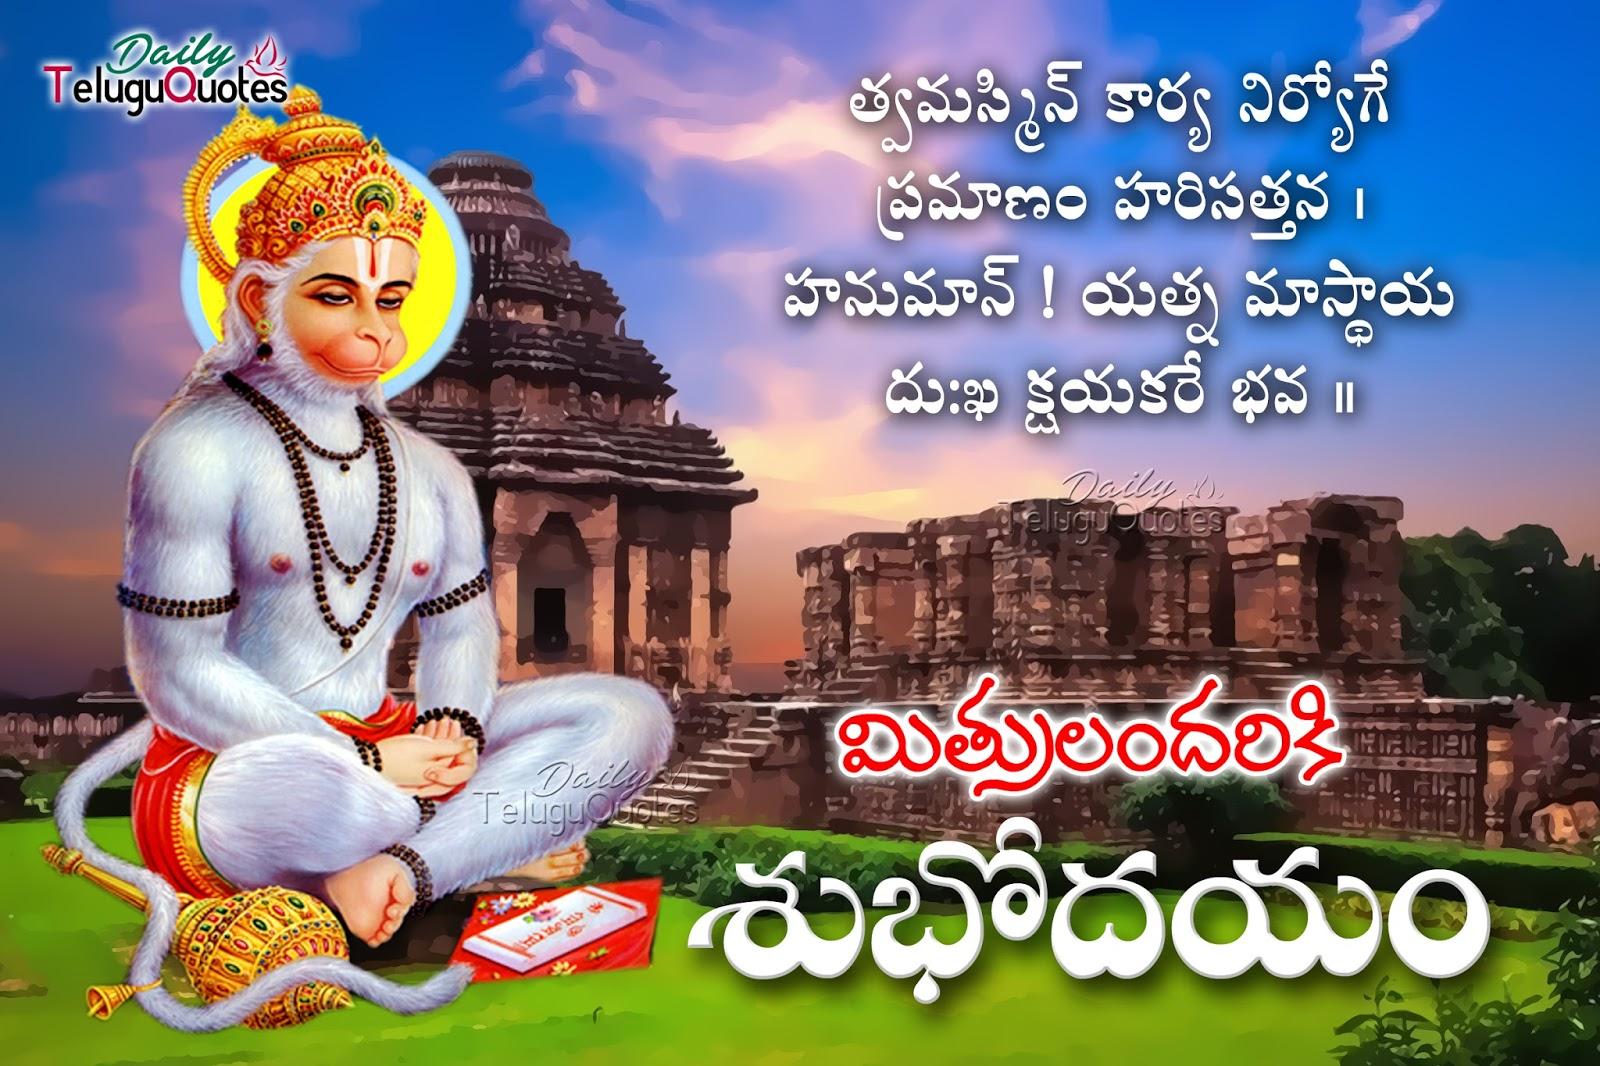 Lord Hanuman Beautyful Telugu Good Morning Quotes And Sayings